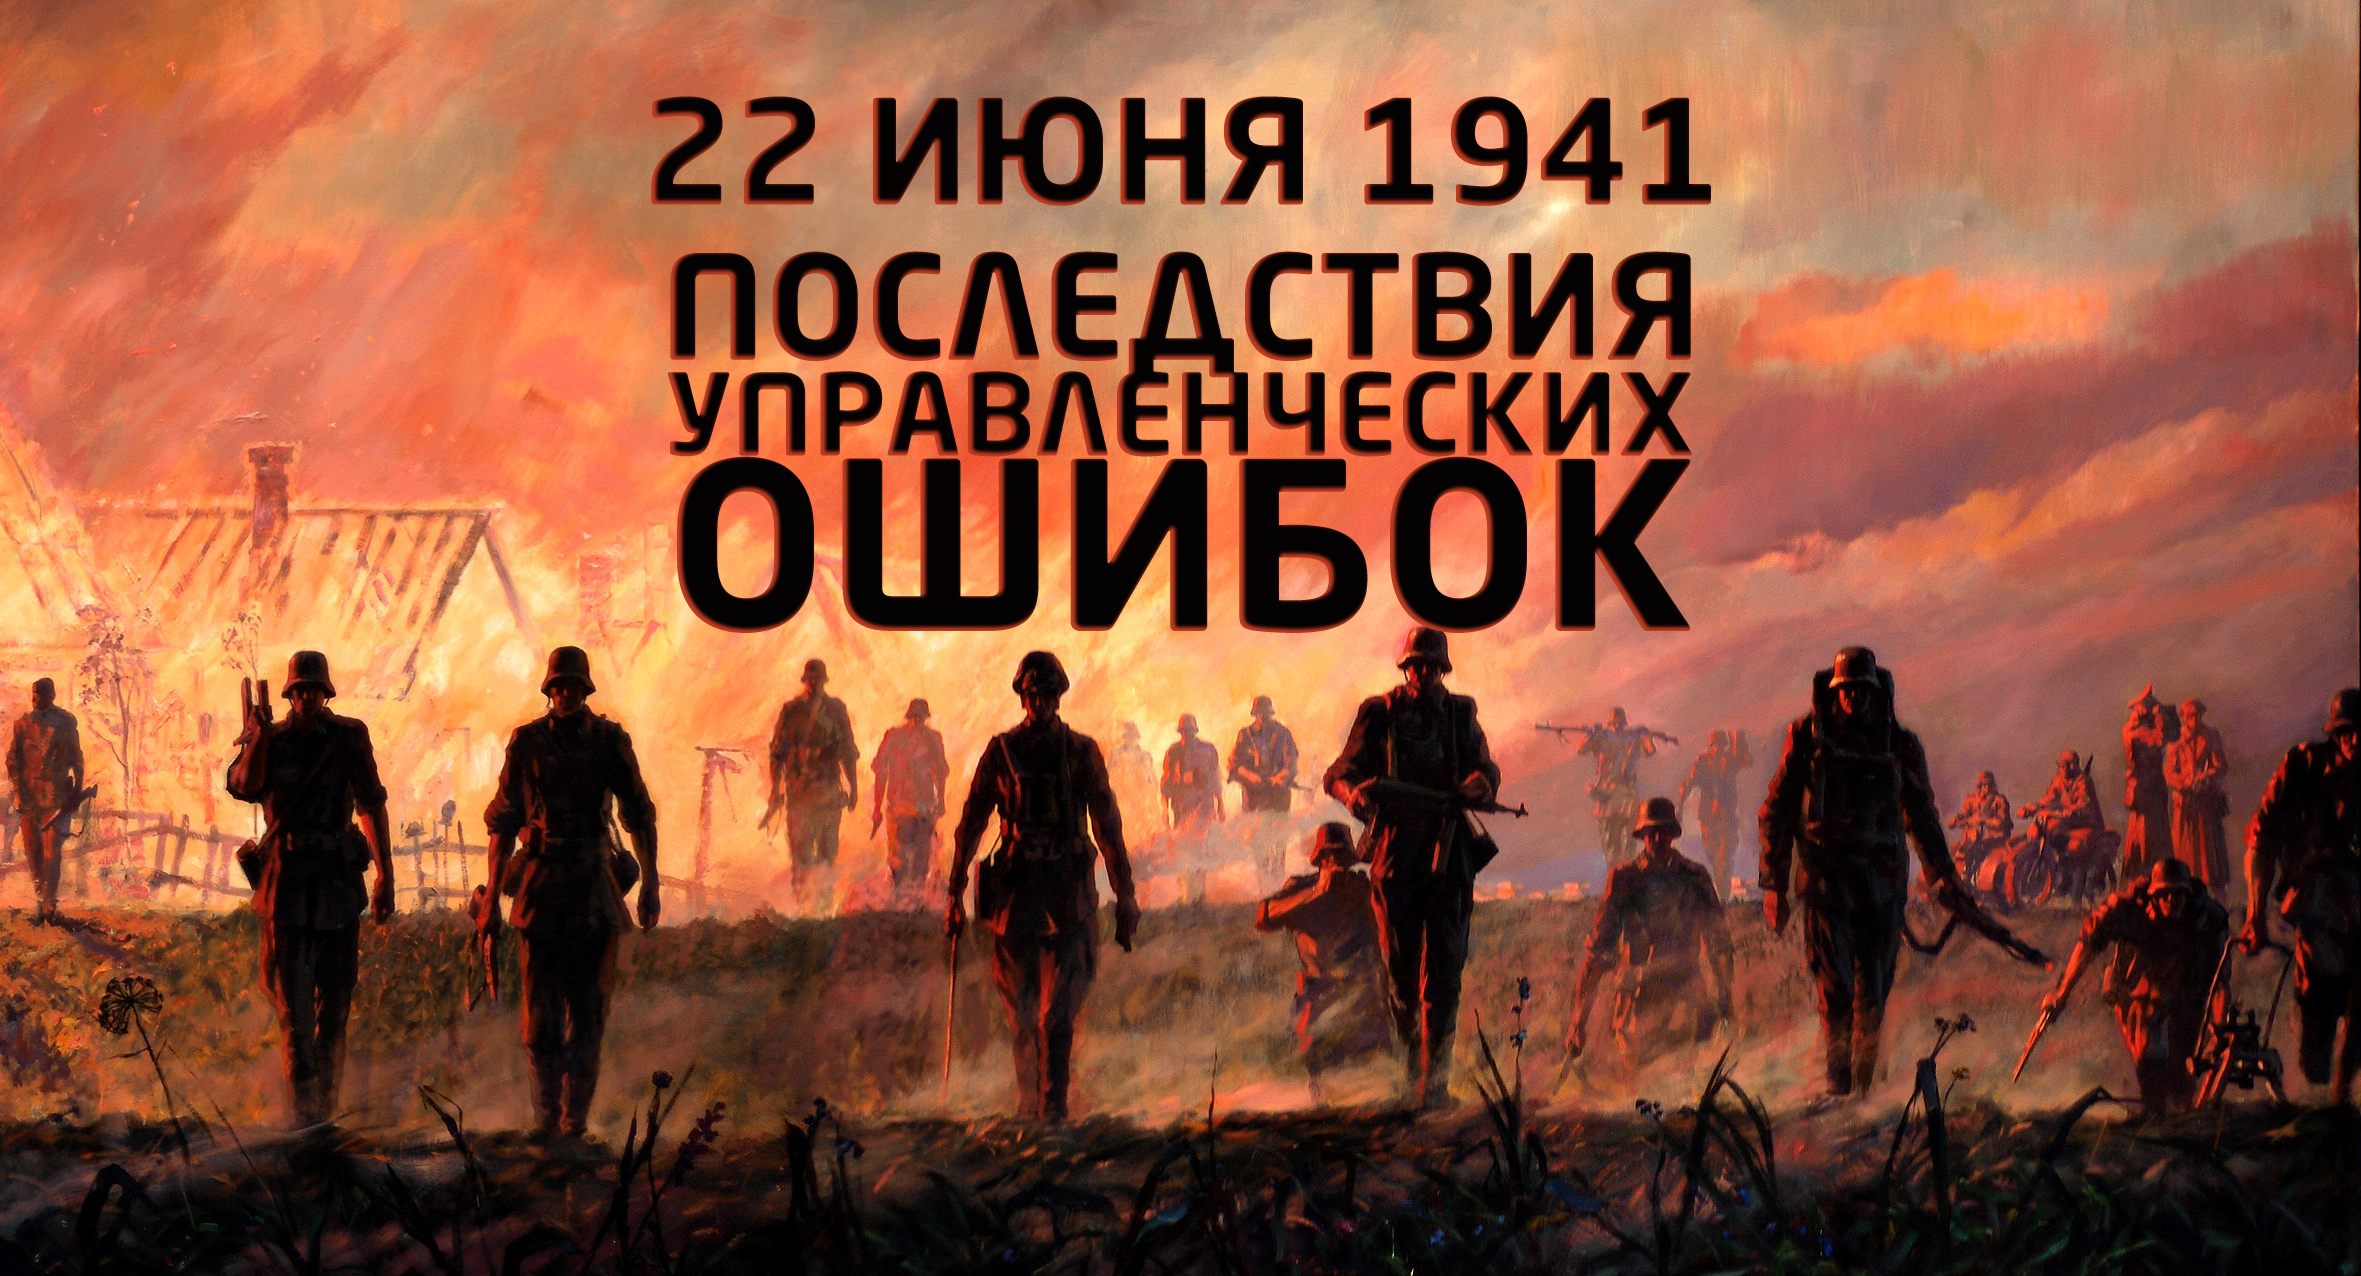 фильм 22 июня 1941